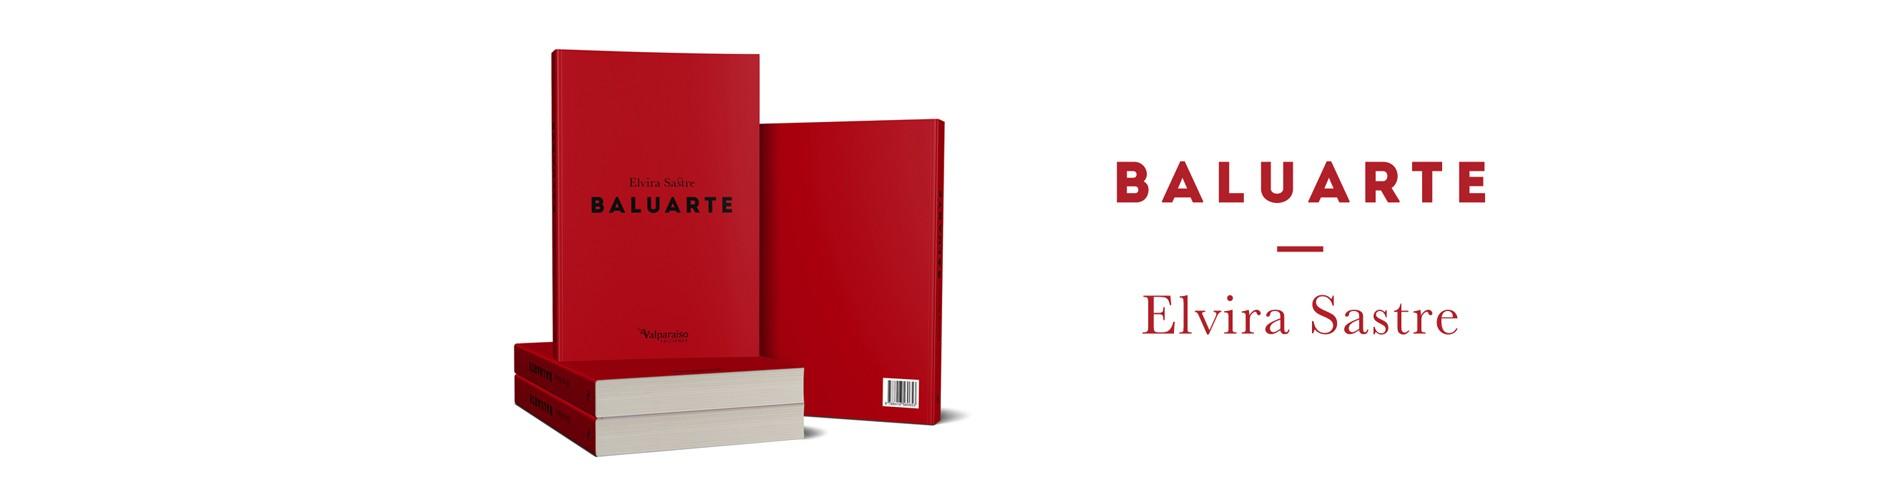 Baluarte deluxe edition